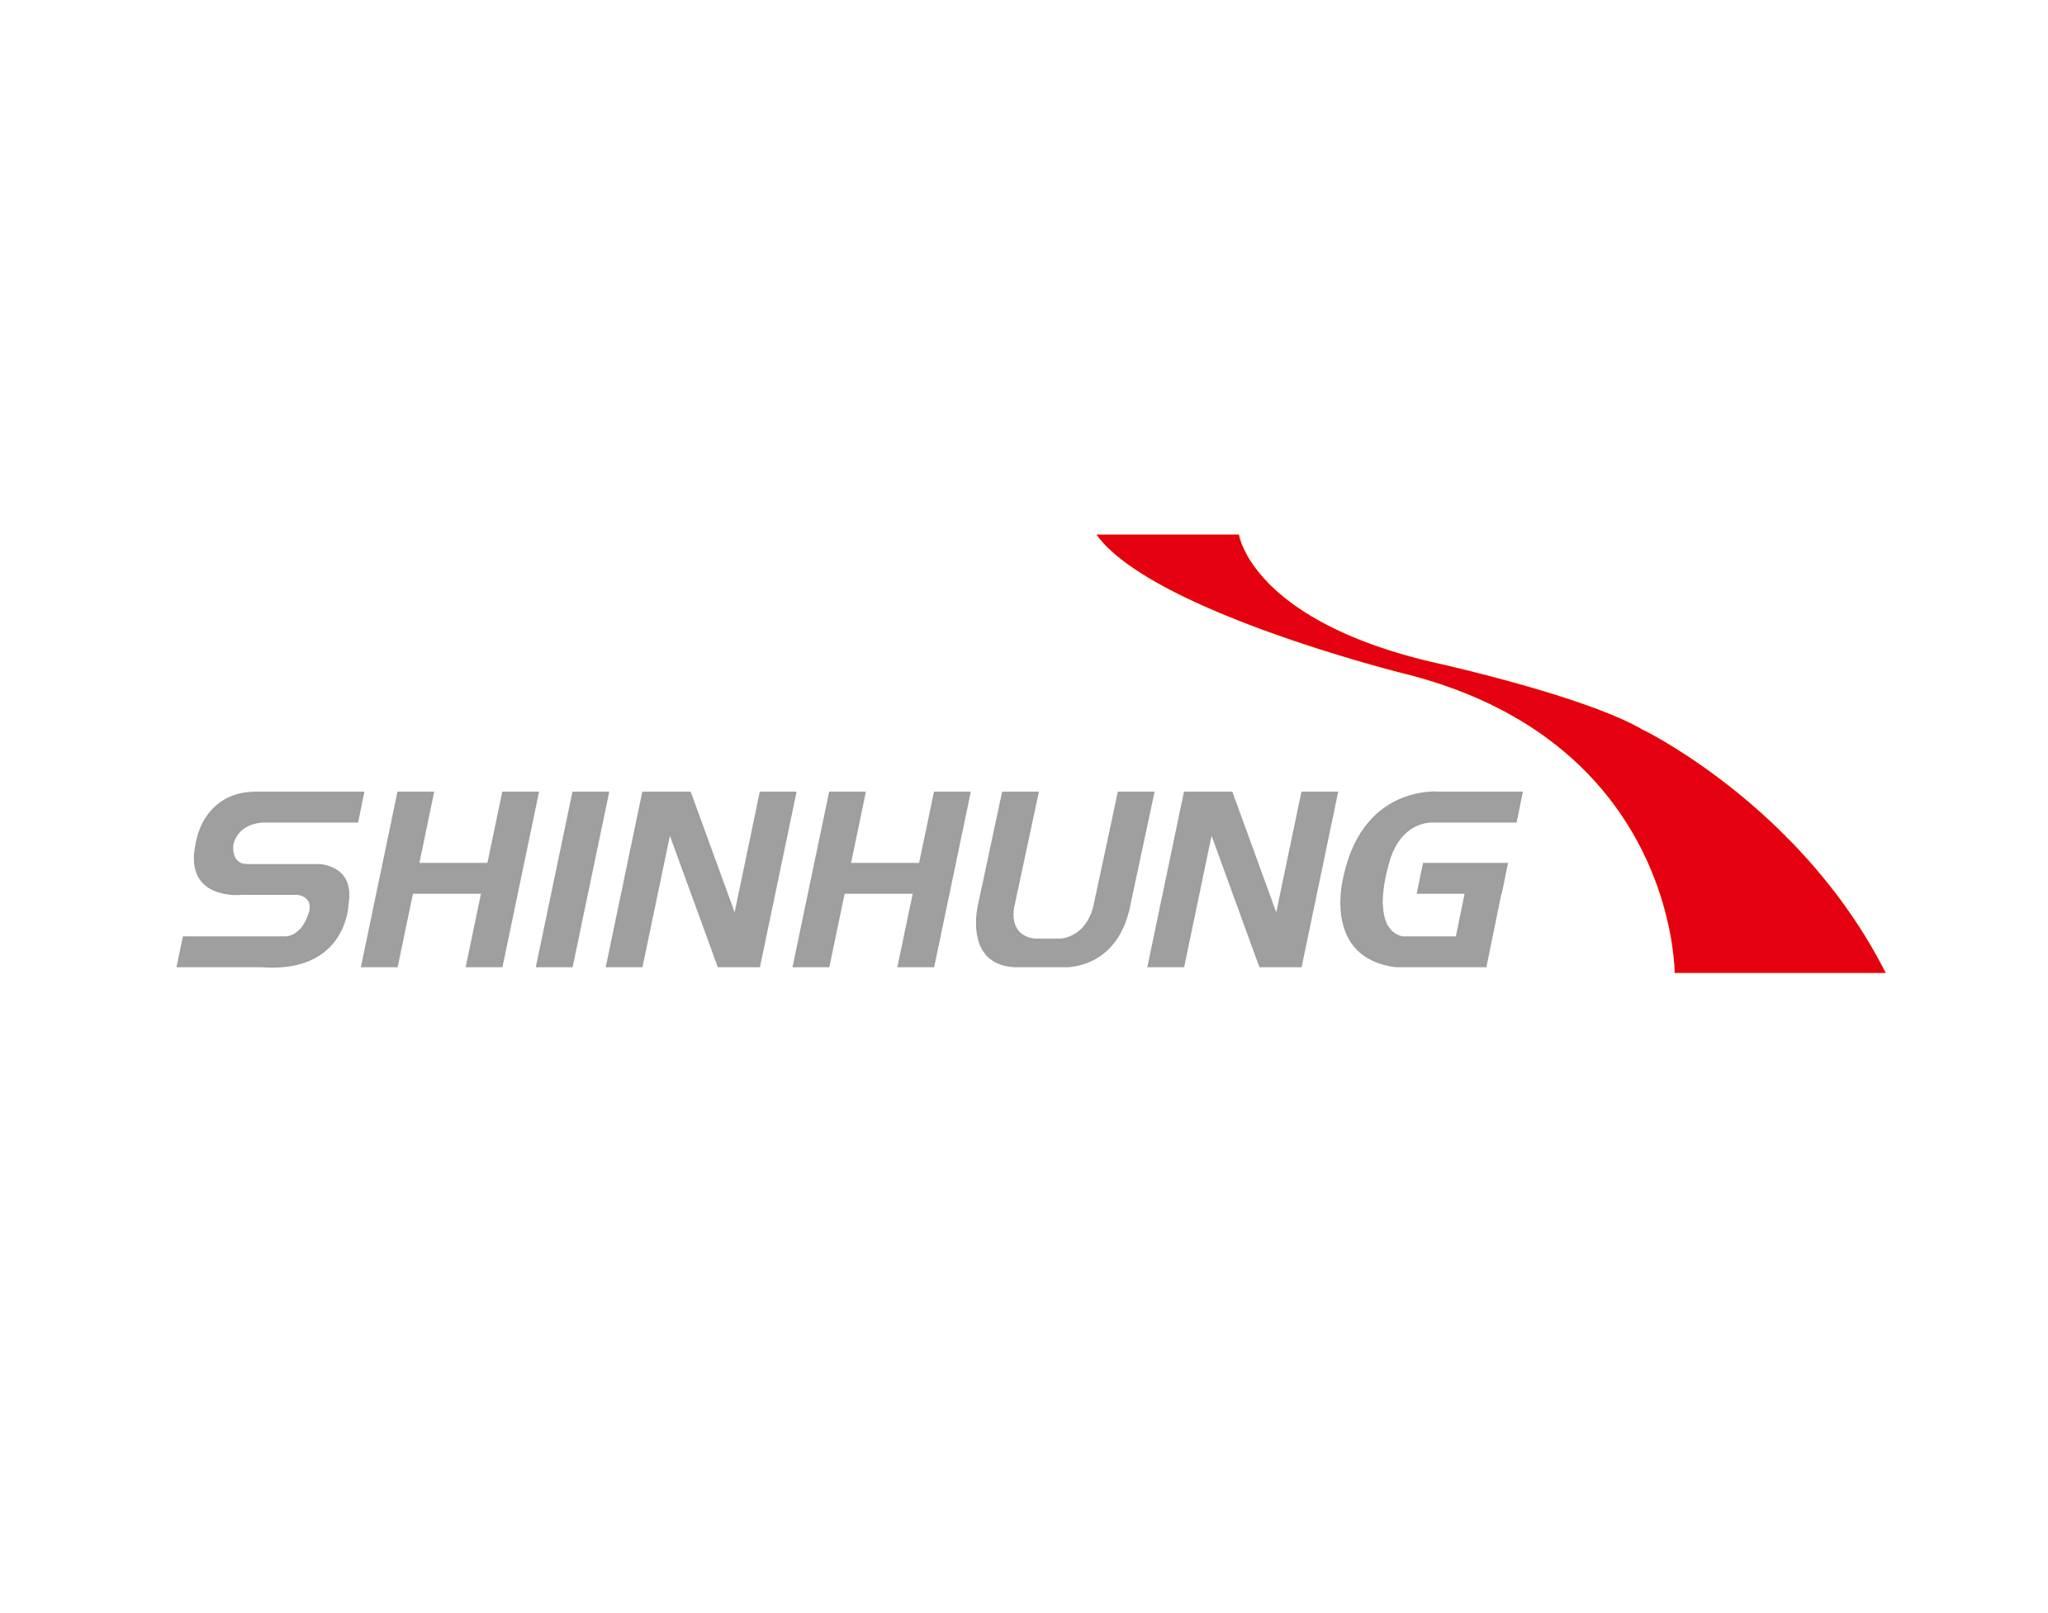 Shinhung Co., Ltd.